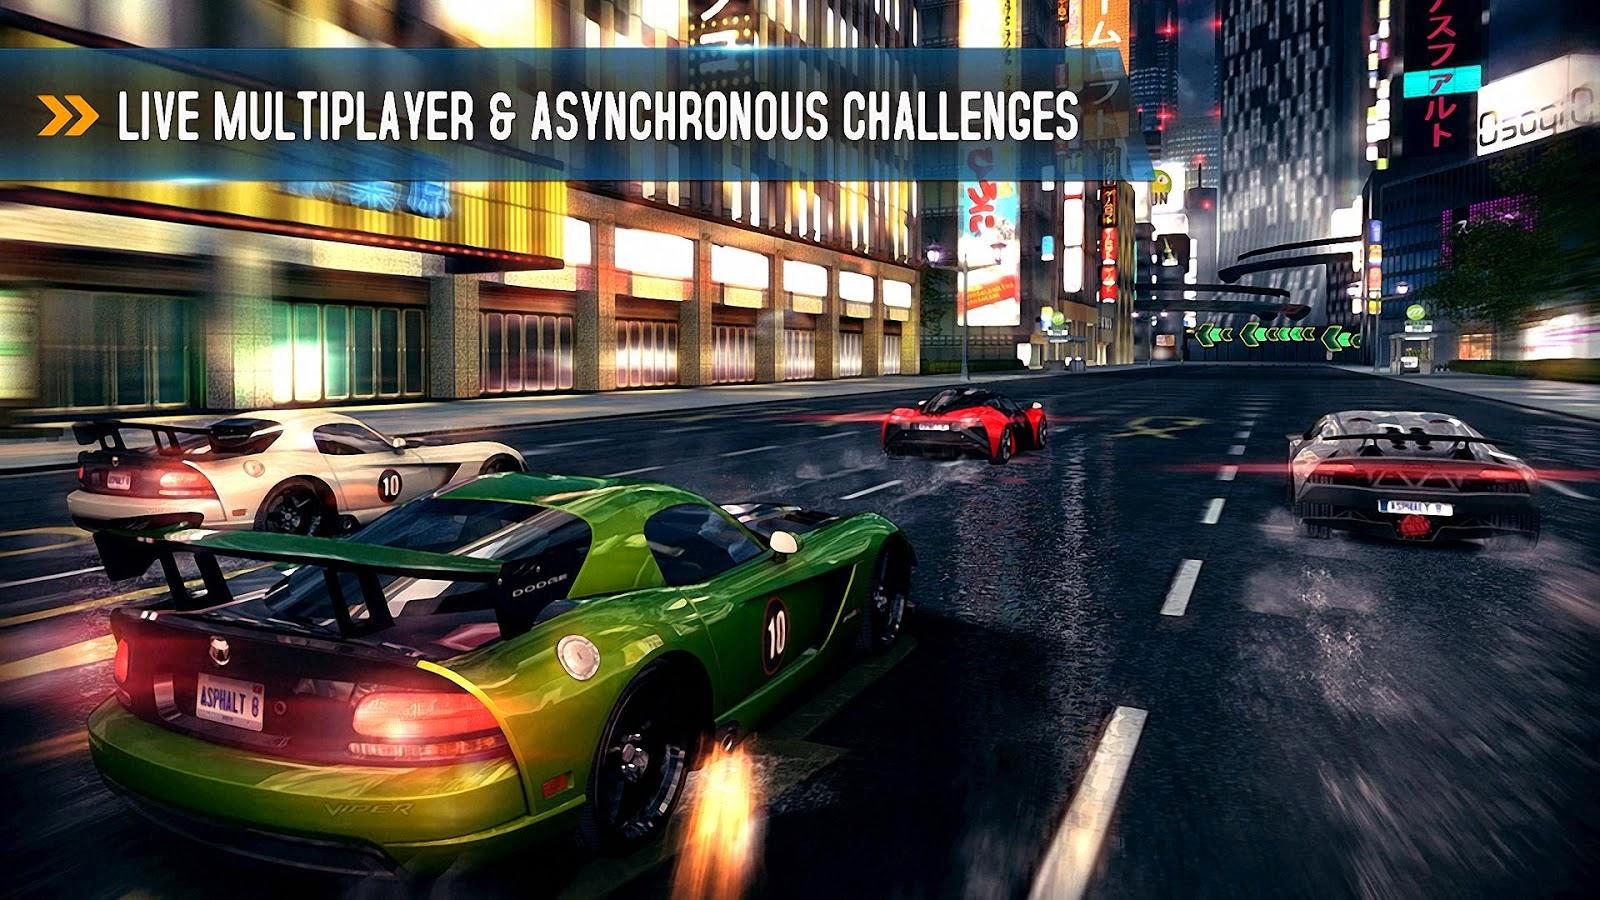 Game Asphalt 8 Airborne v1.7.0 APK Mod Terbaru screenshot by www.jembercyber.blogspot.com